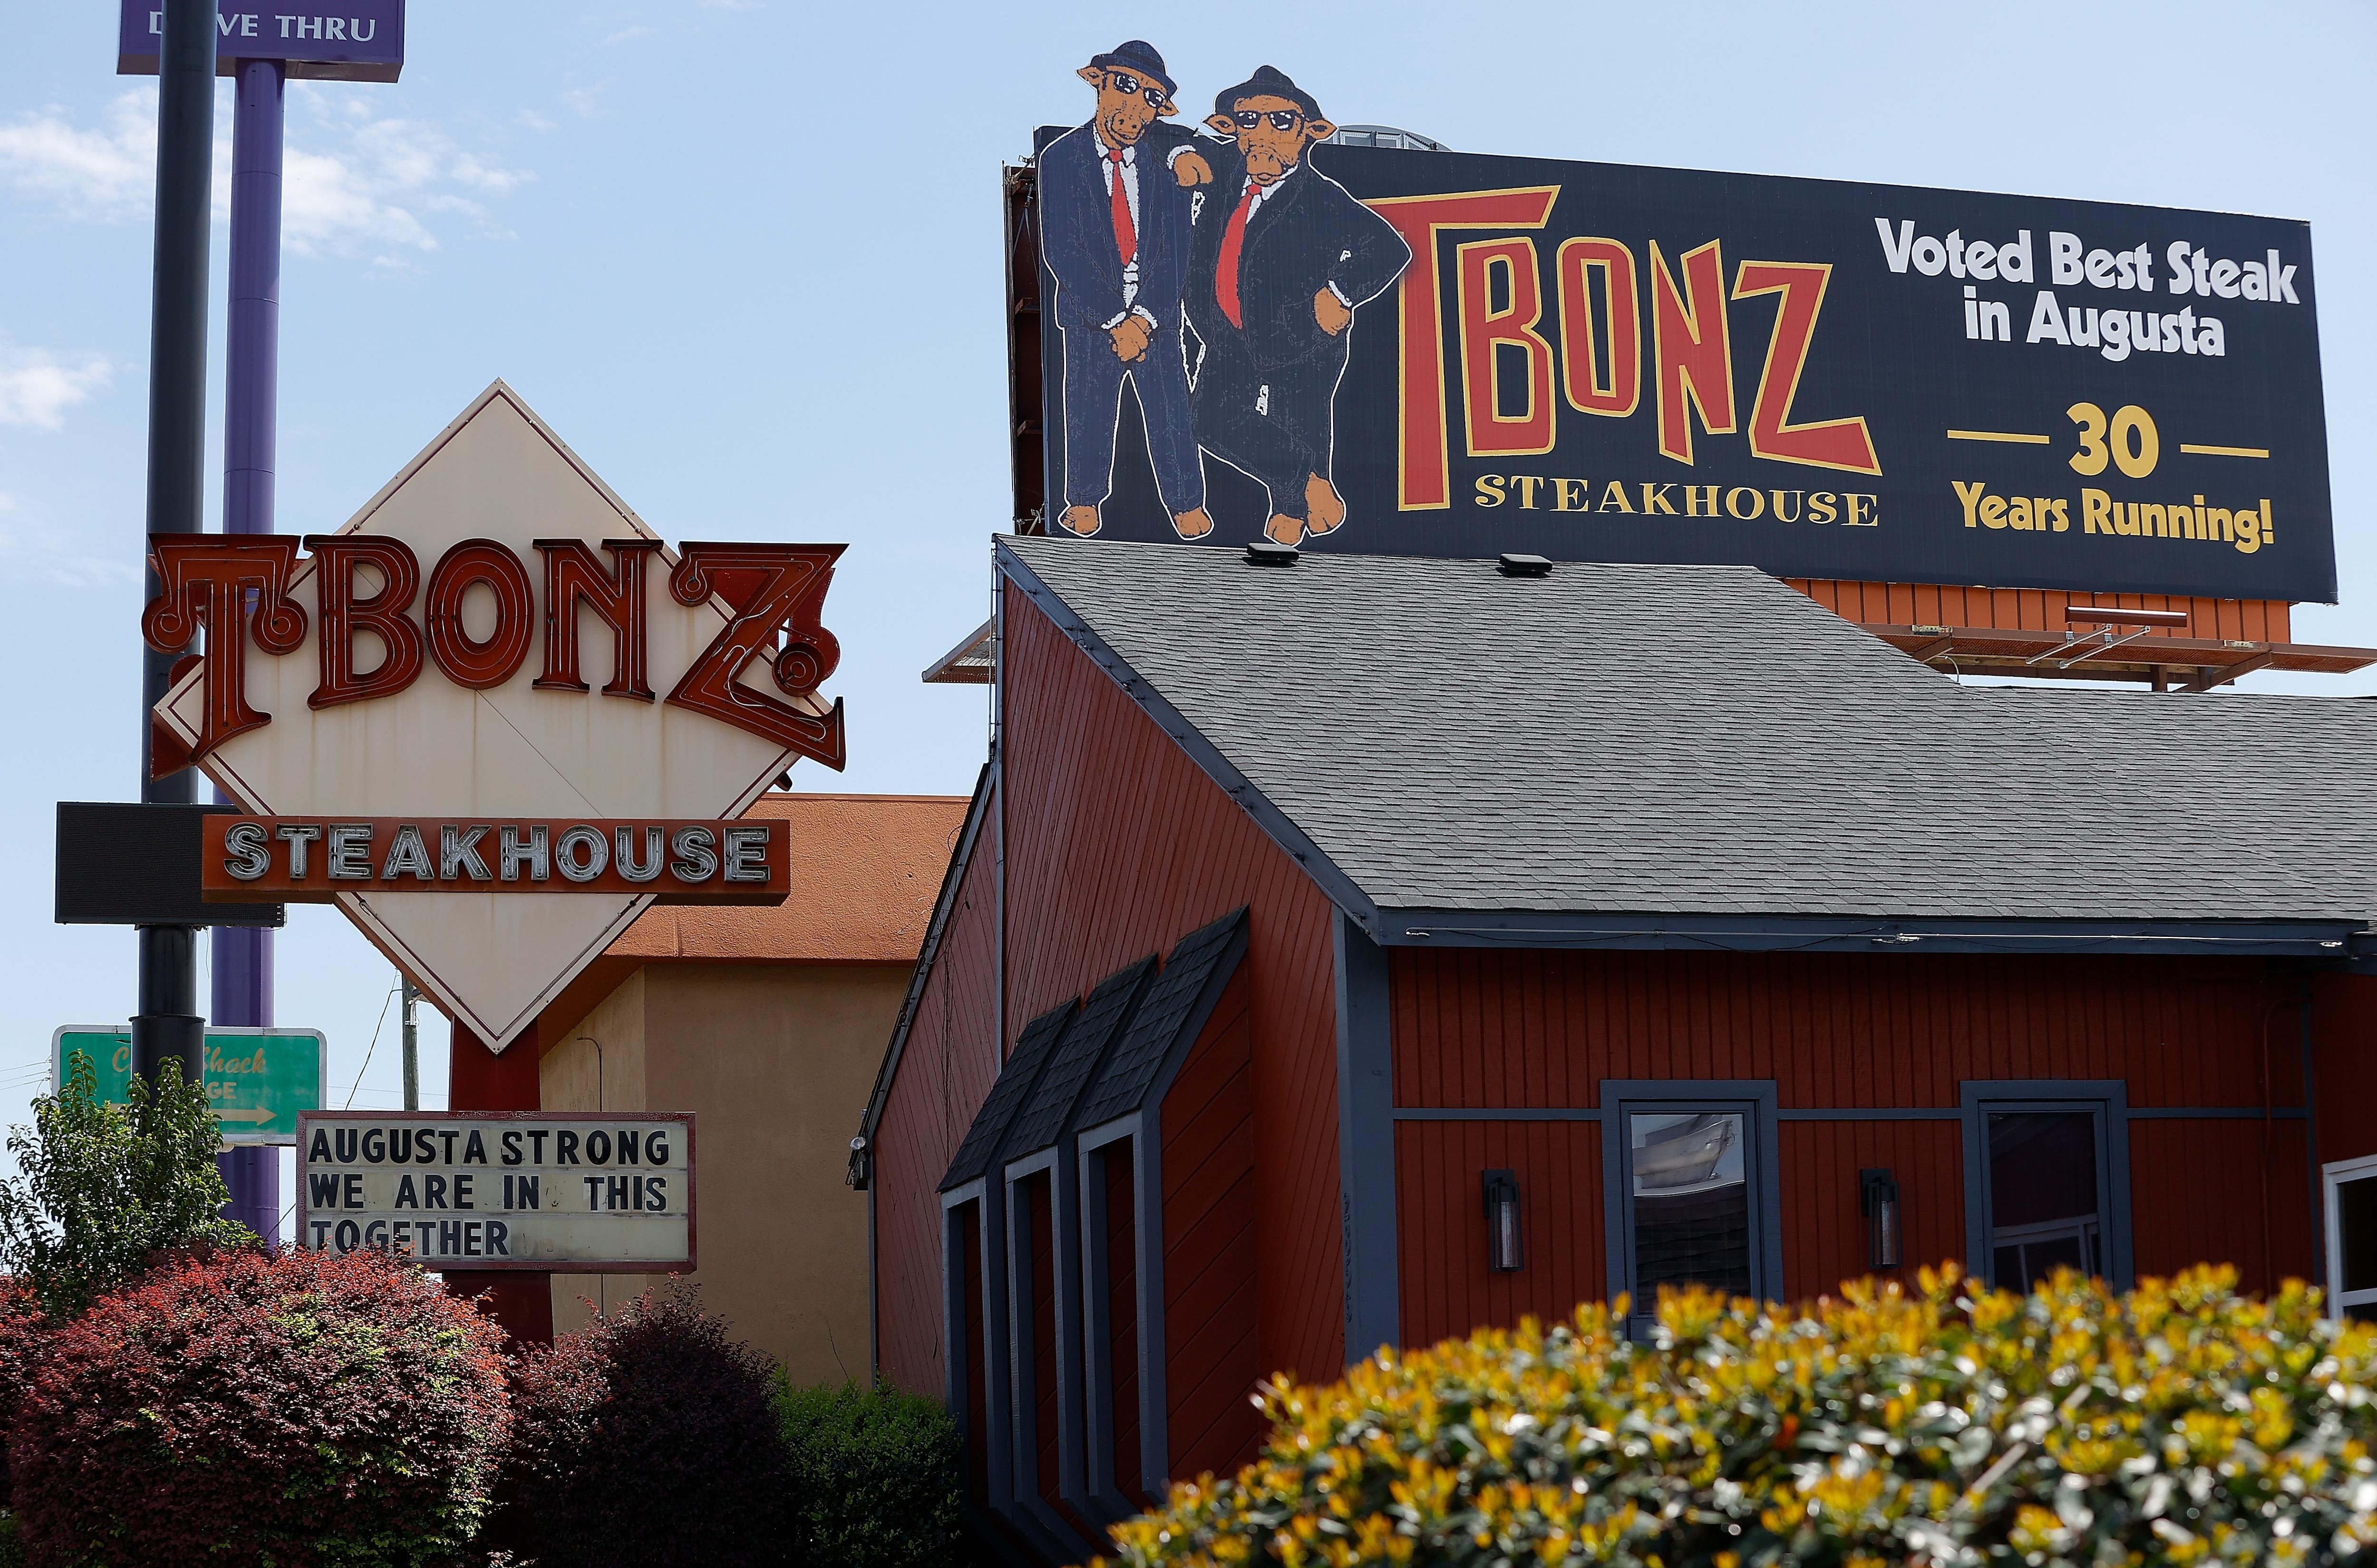 T-Bonz Steakhouse